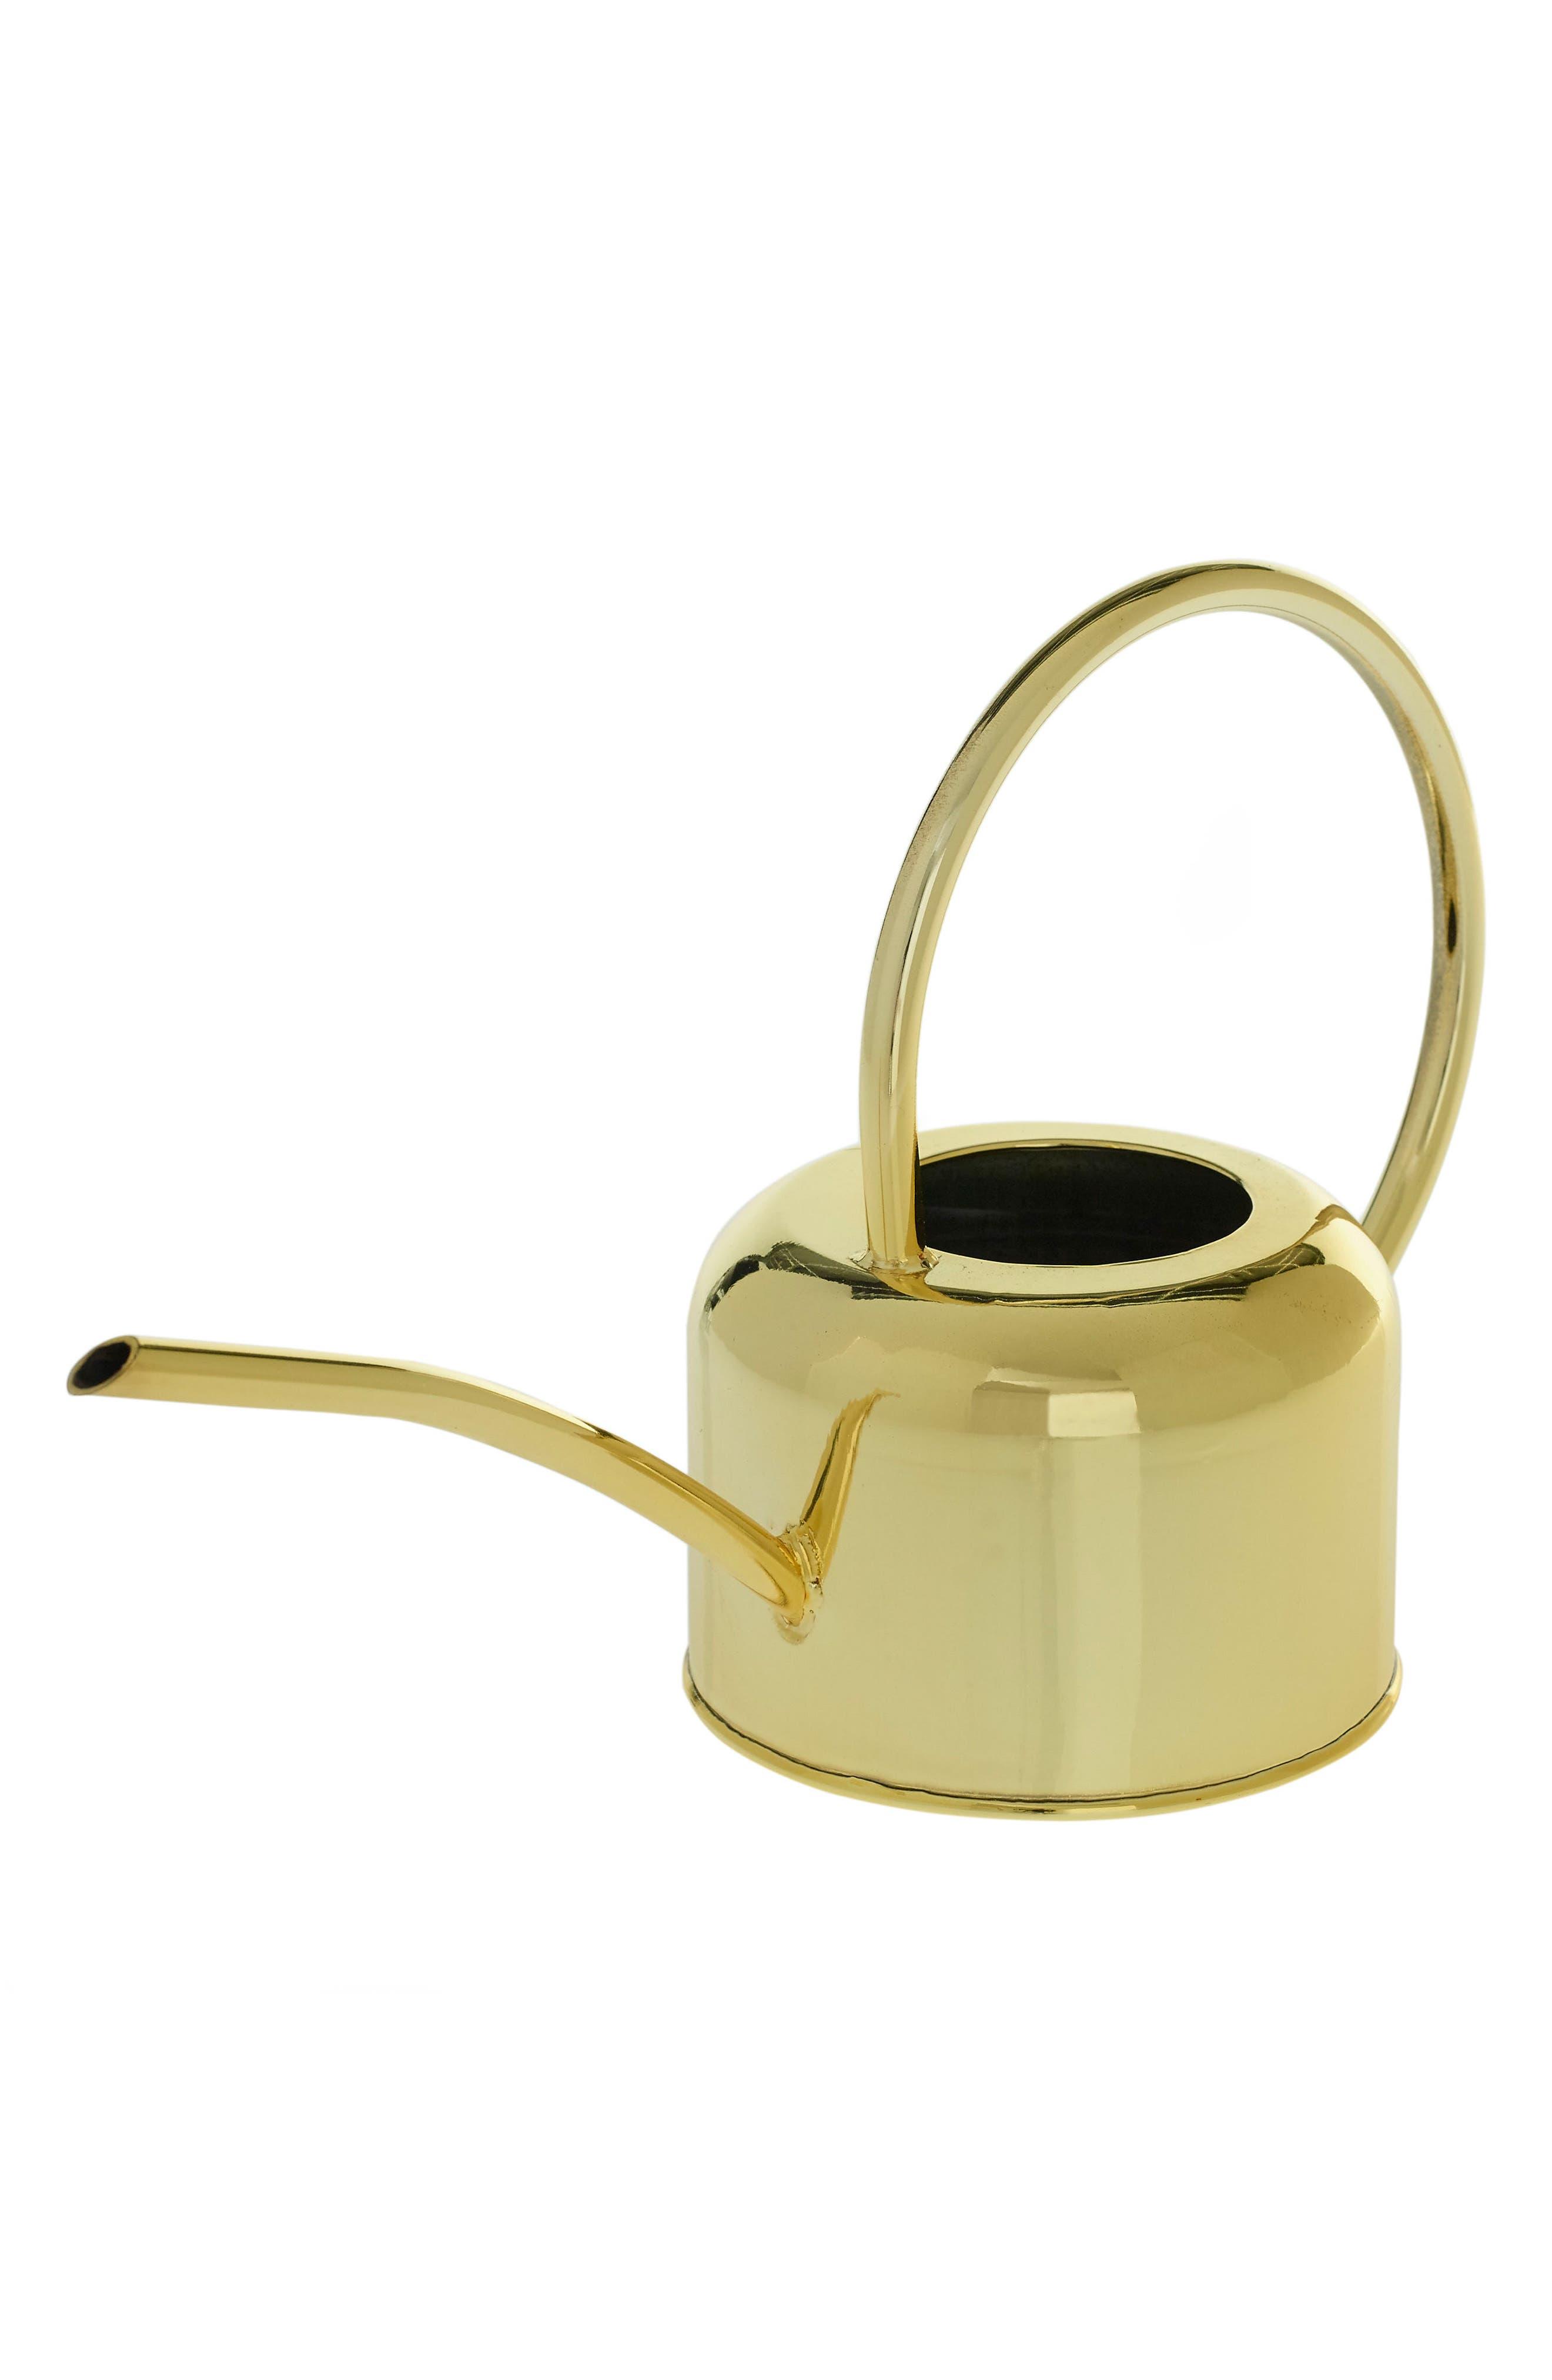 Henri Watering Can,                         Main,                         color, Metallic Gold